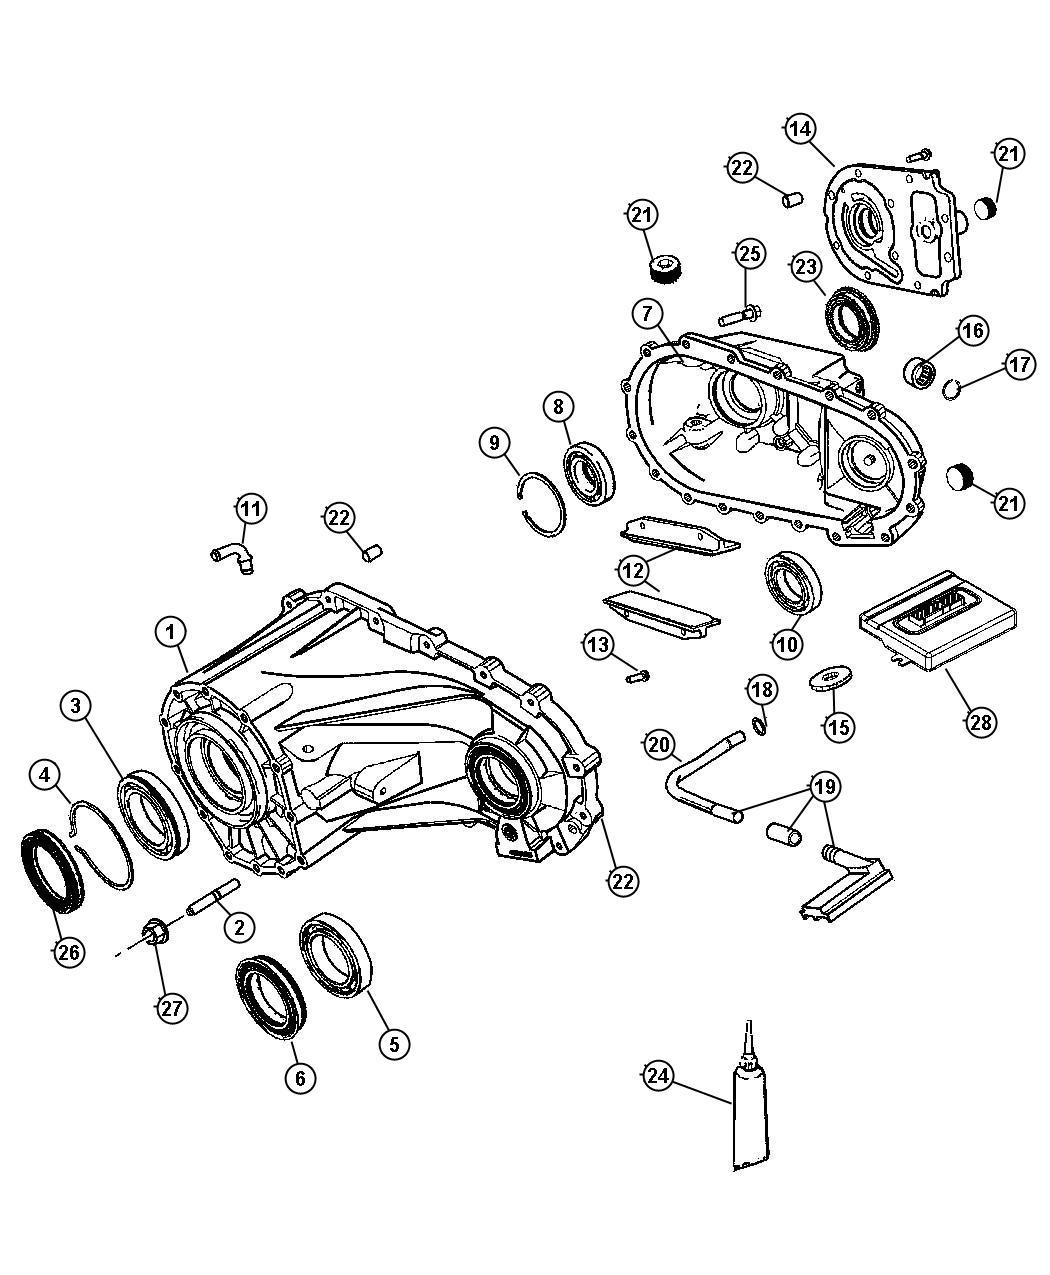 Jeep Wrangler Snap Ring